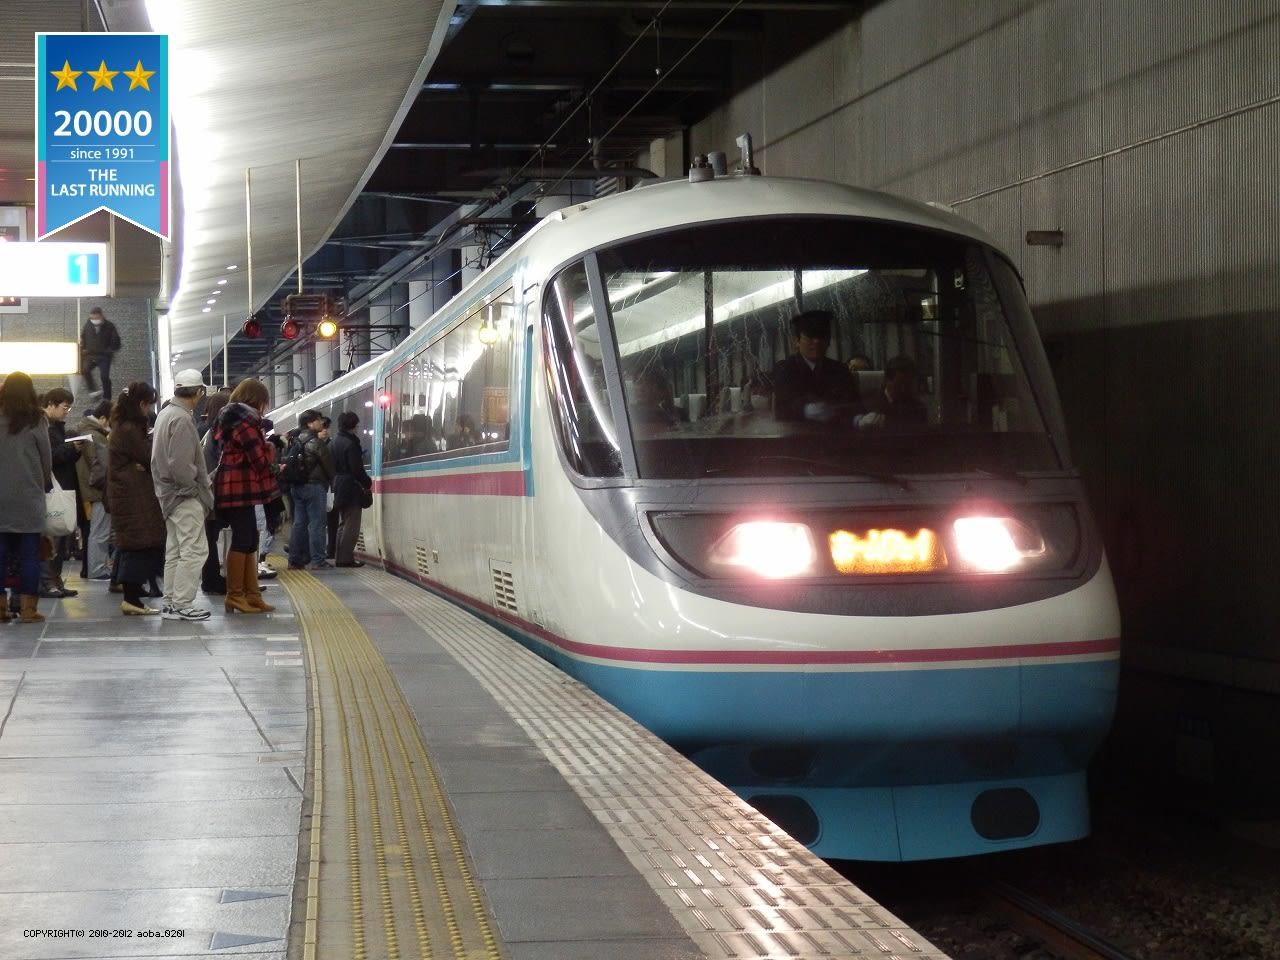 小田急20000形 Rse 20002f 壁紙置き場 列車番号1042の部屋